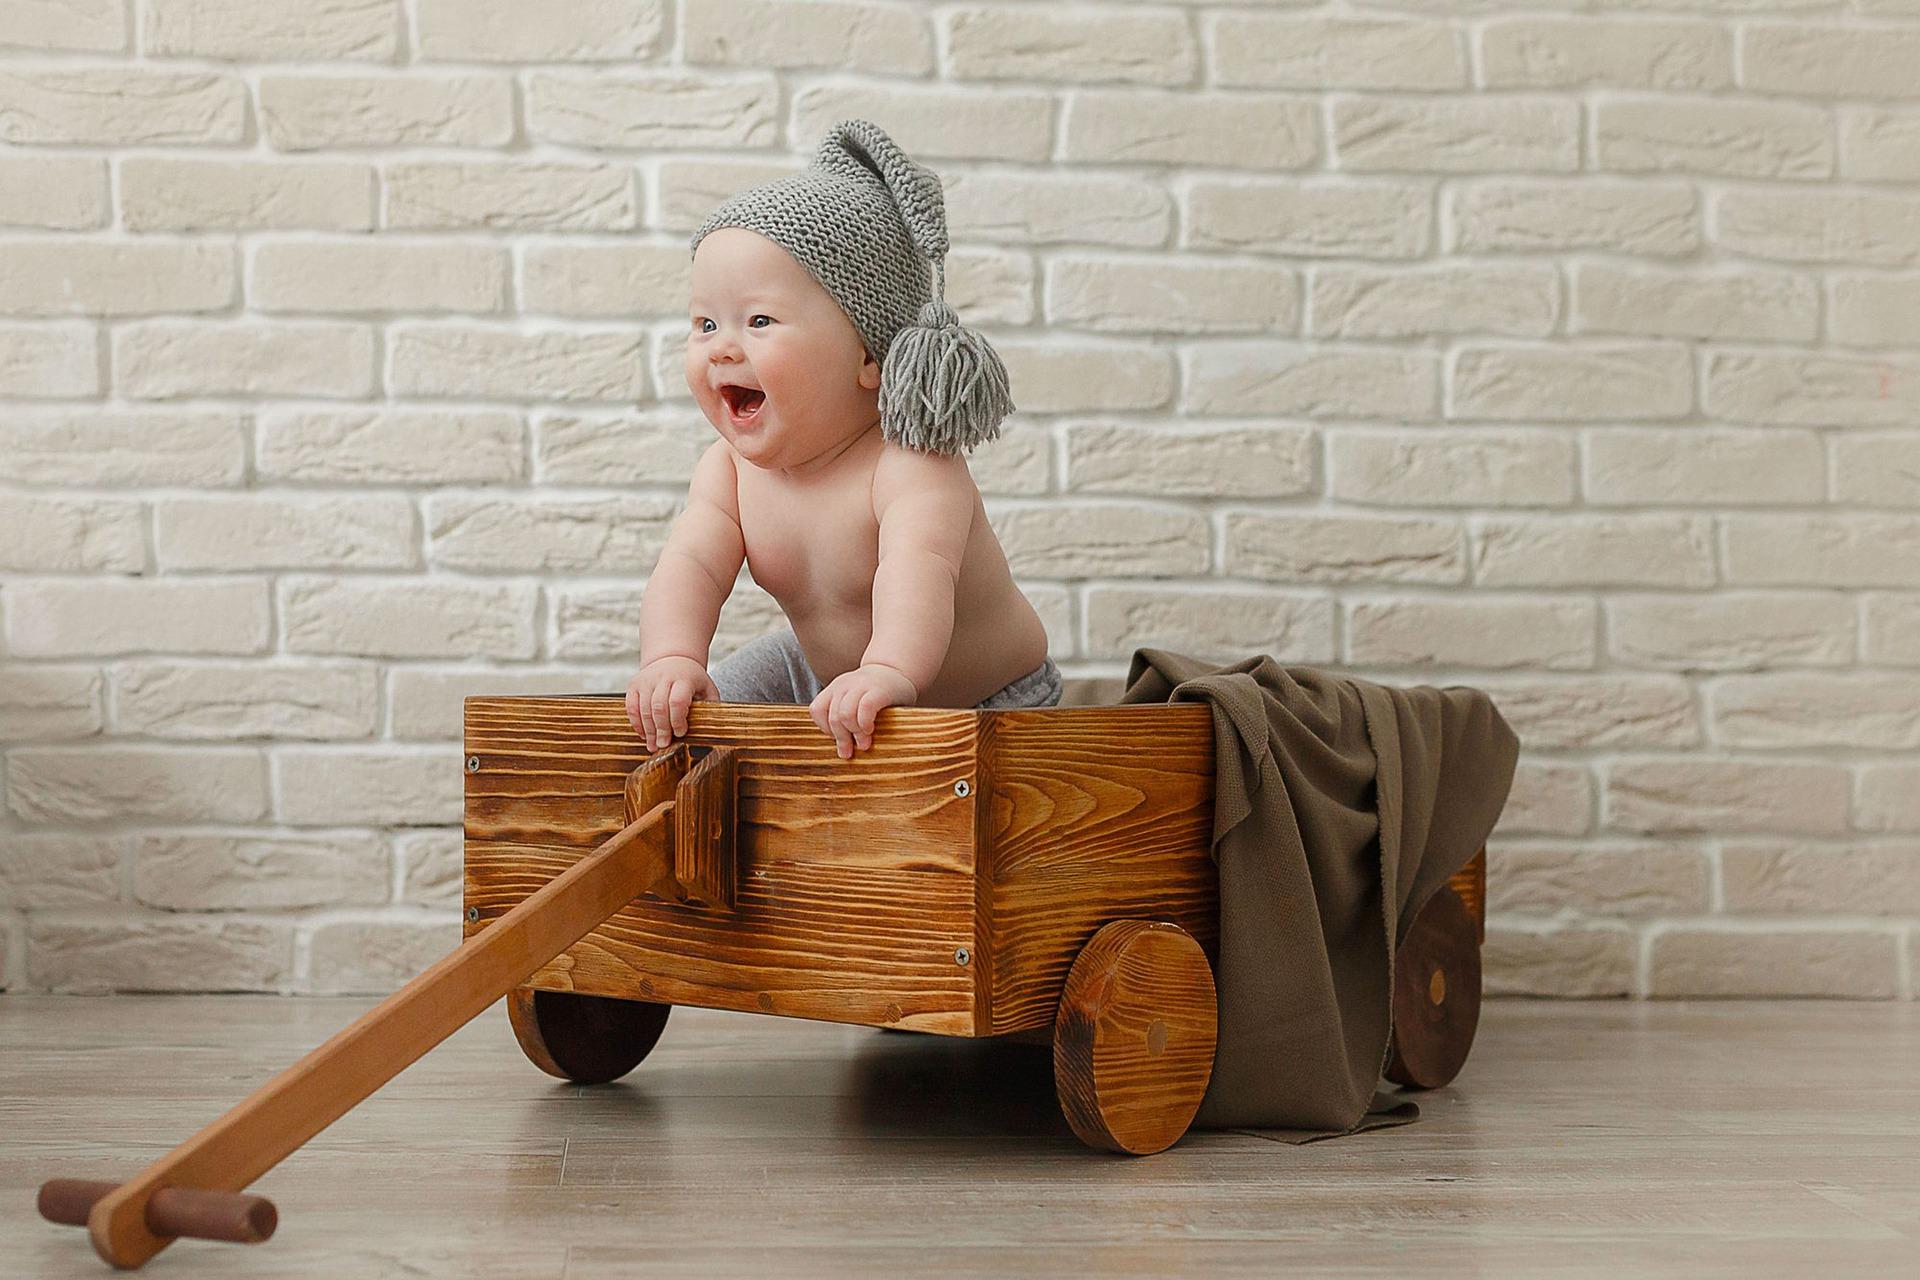 baby-4210495_1920.jpg